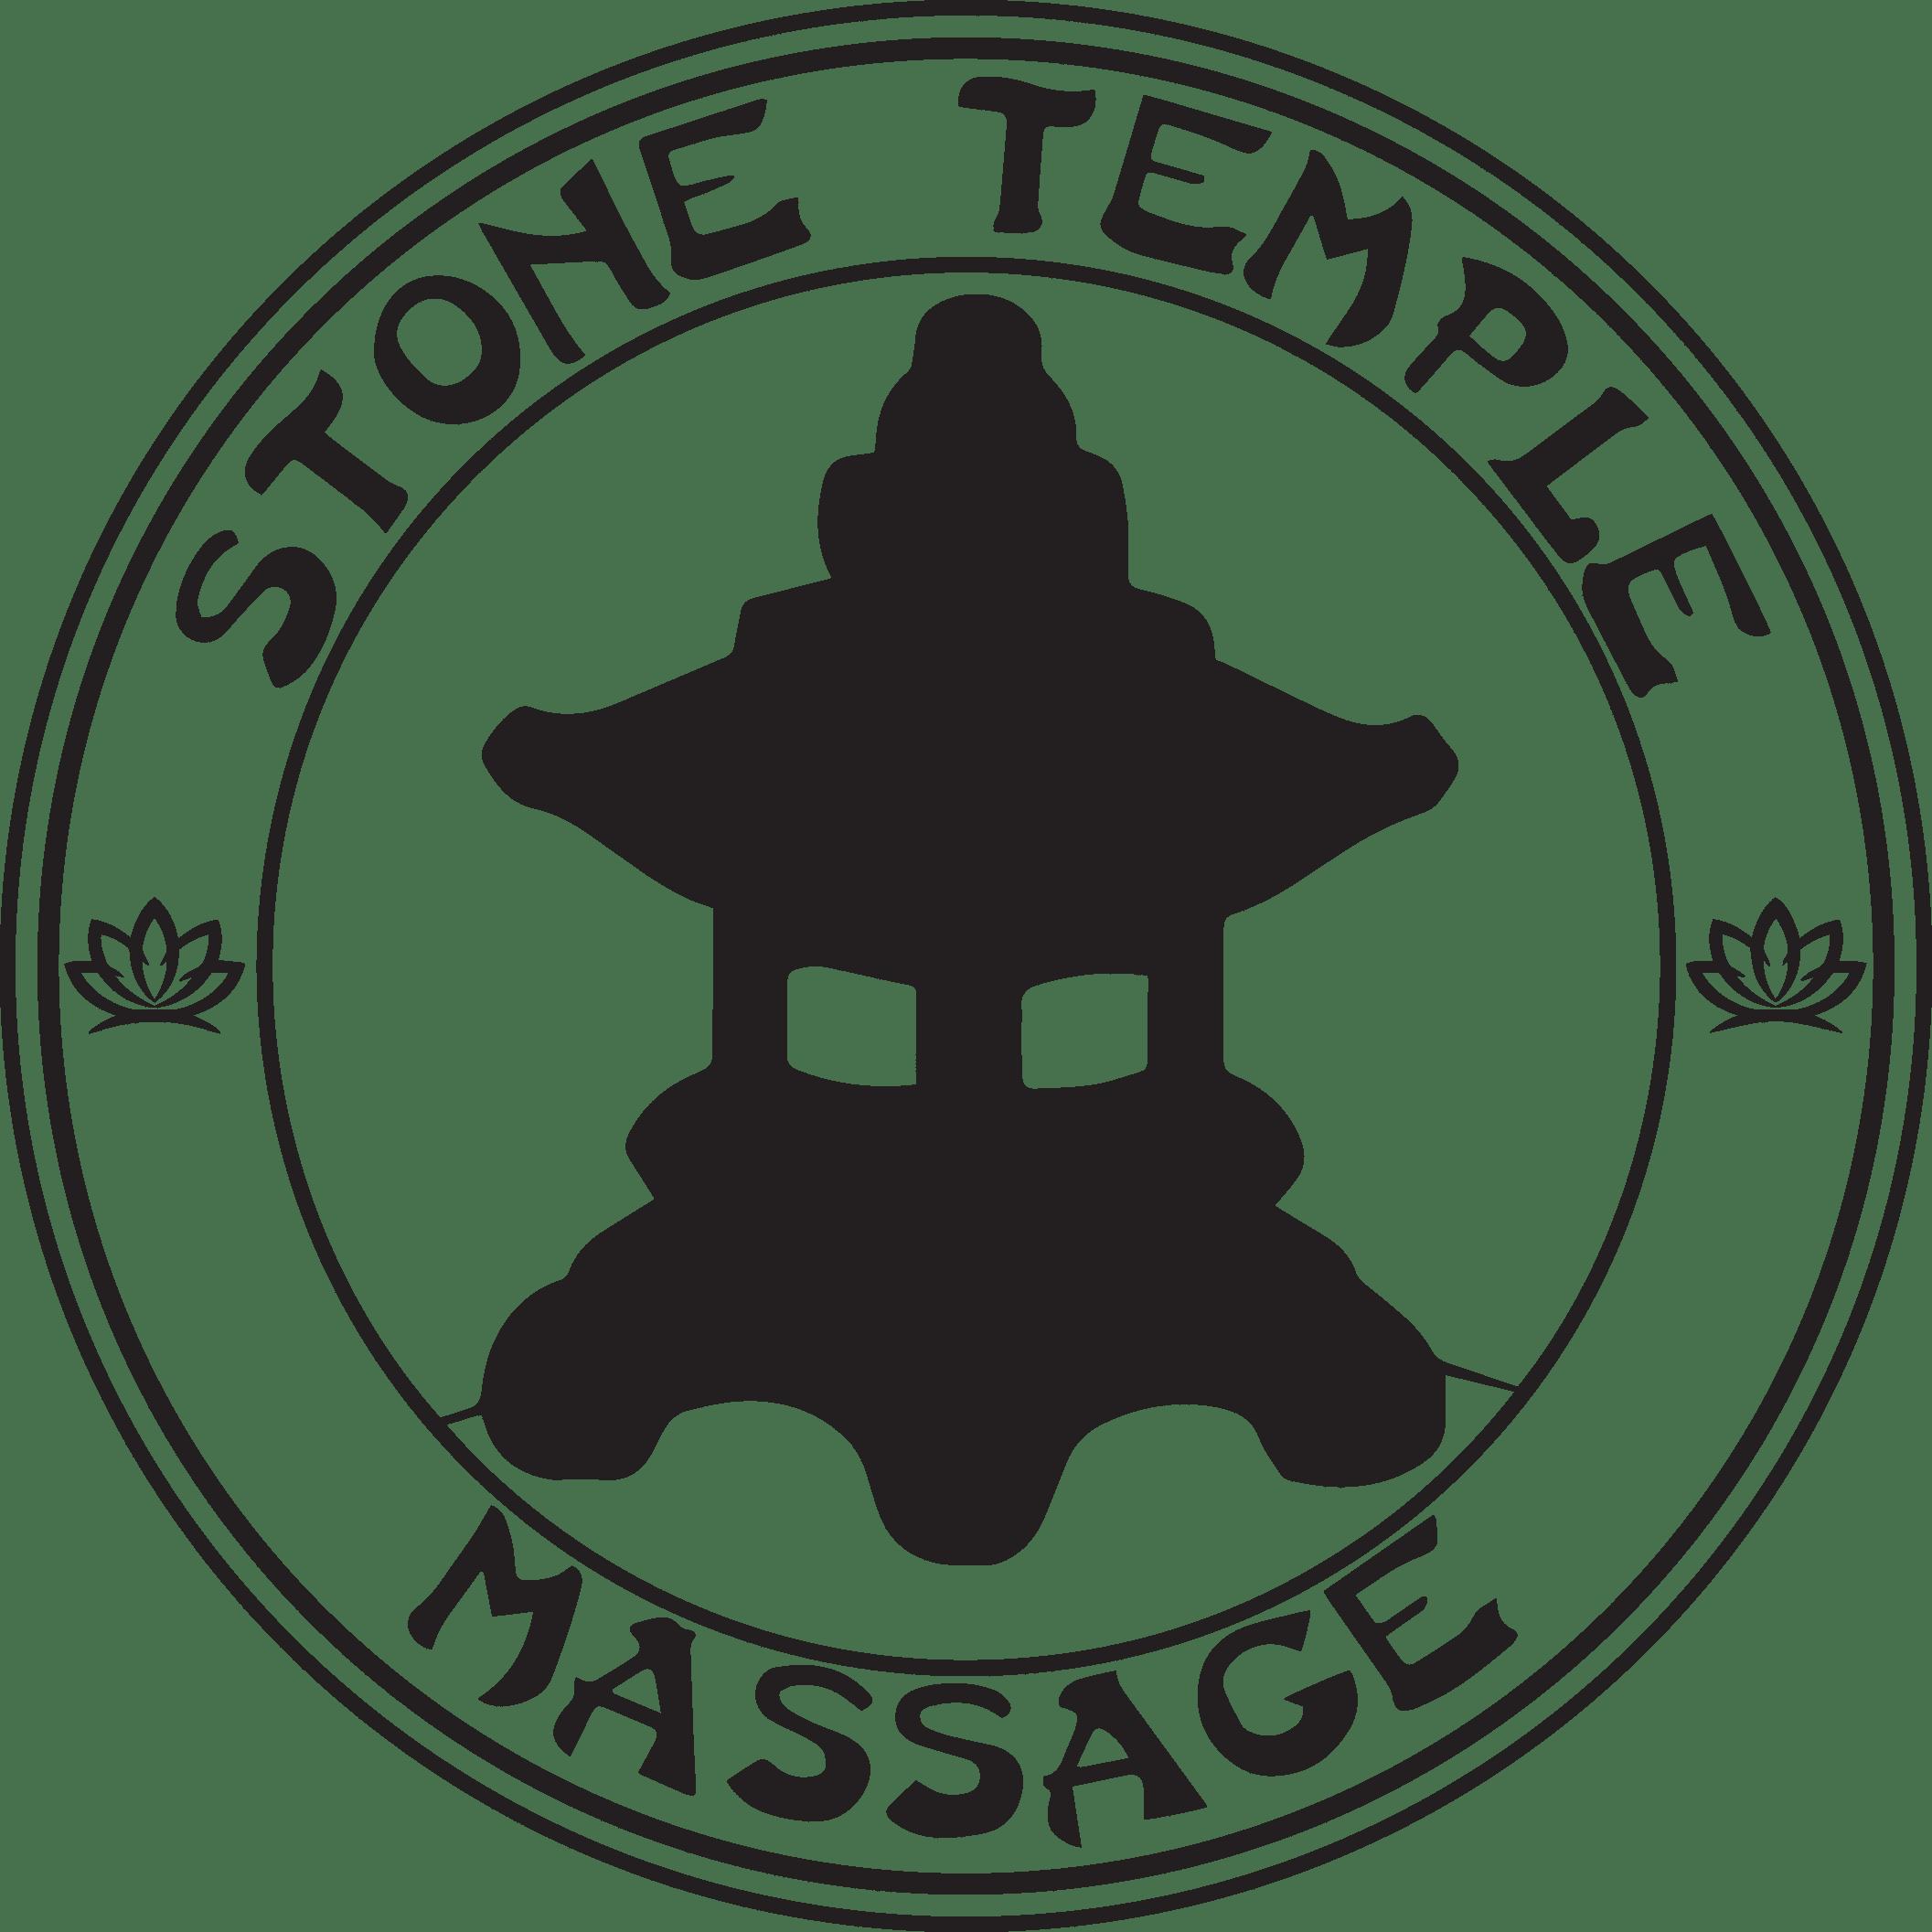 Stone Temple Massage